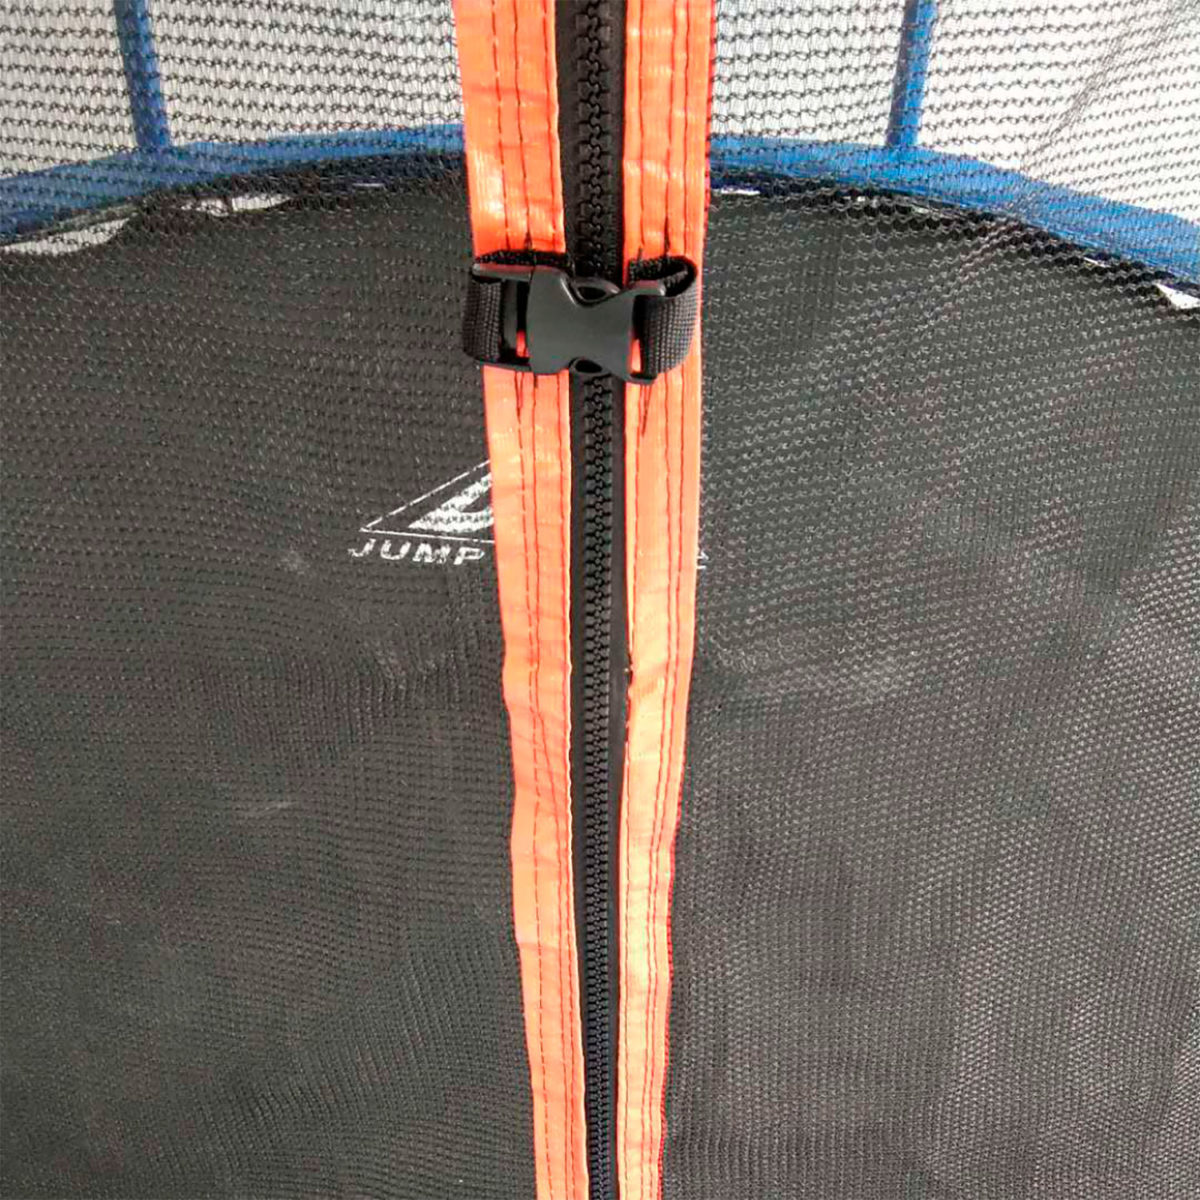 DFC Батут DFC JUMP BASKET с внутр. сеткой, лестница (305 см) - 3